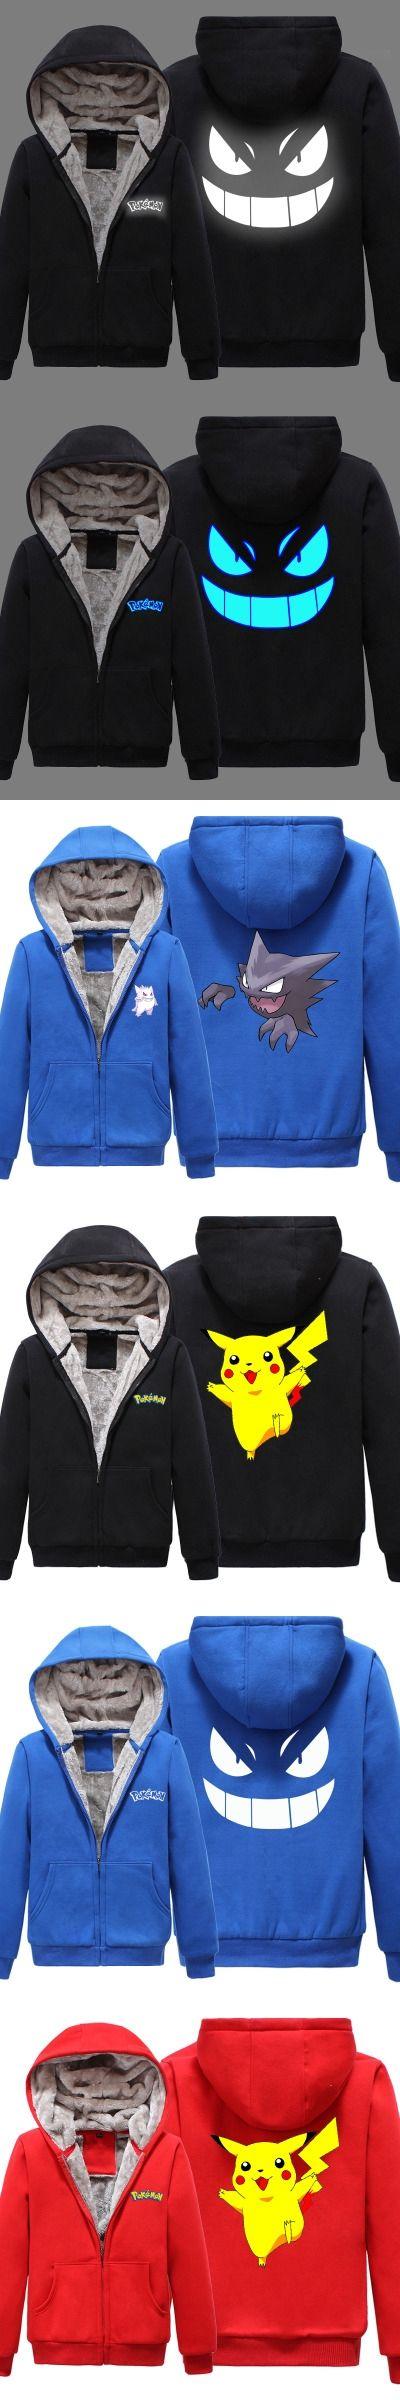 P01 New Winter Jackets and Coat  Pocket Monster Gengar reflect light hoodie Anime Pokemon Go 2 Luminous Thick Men Sweatshirts